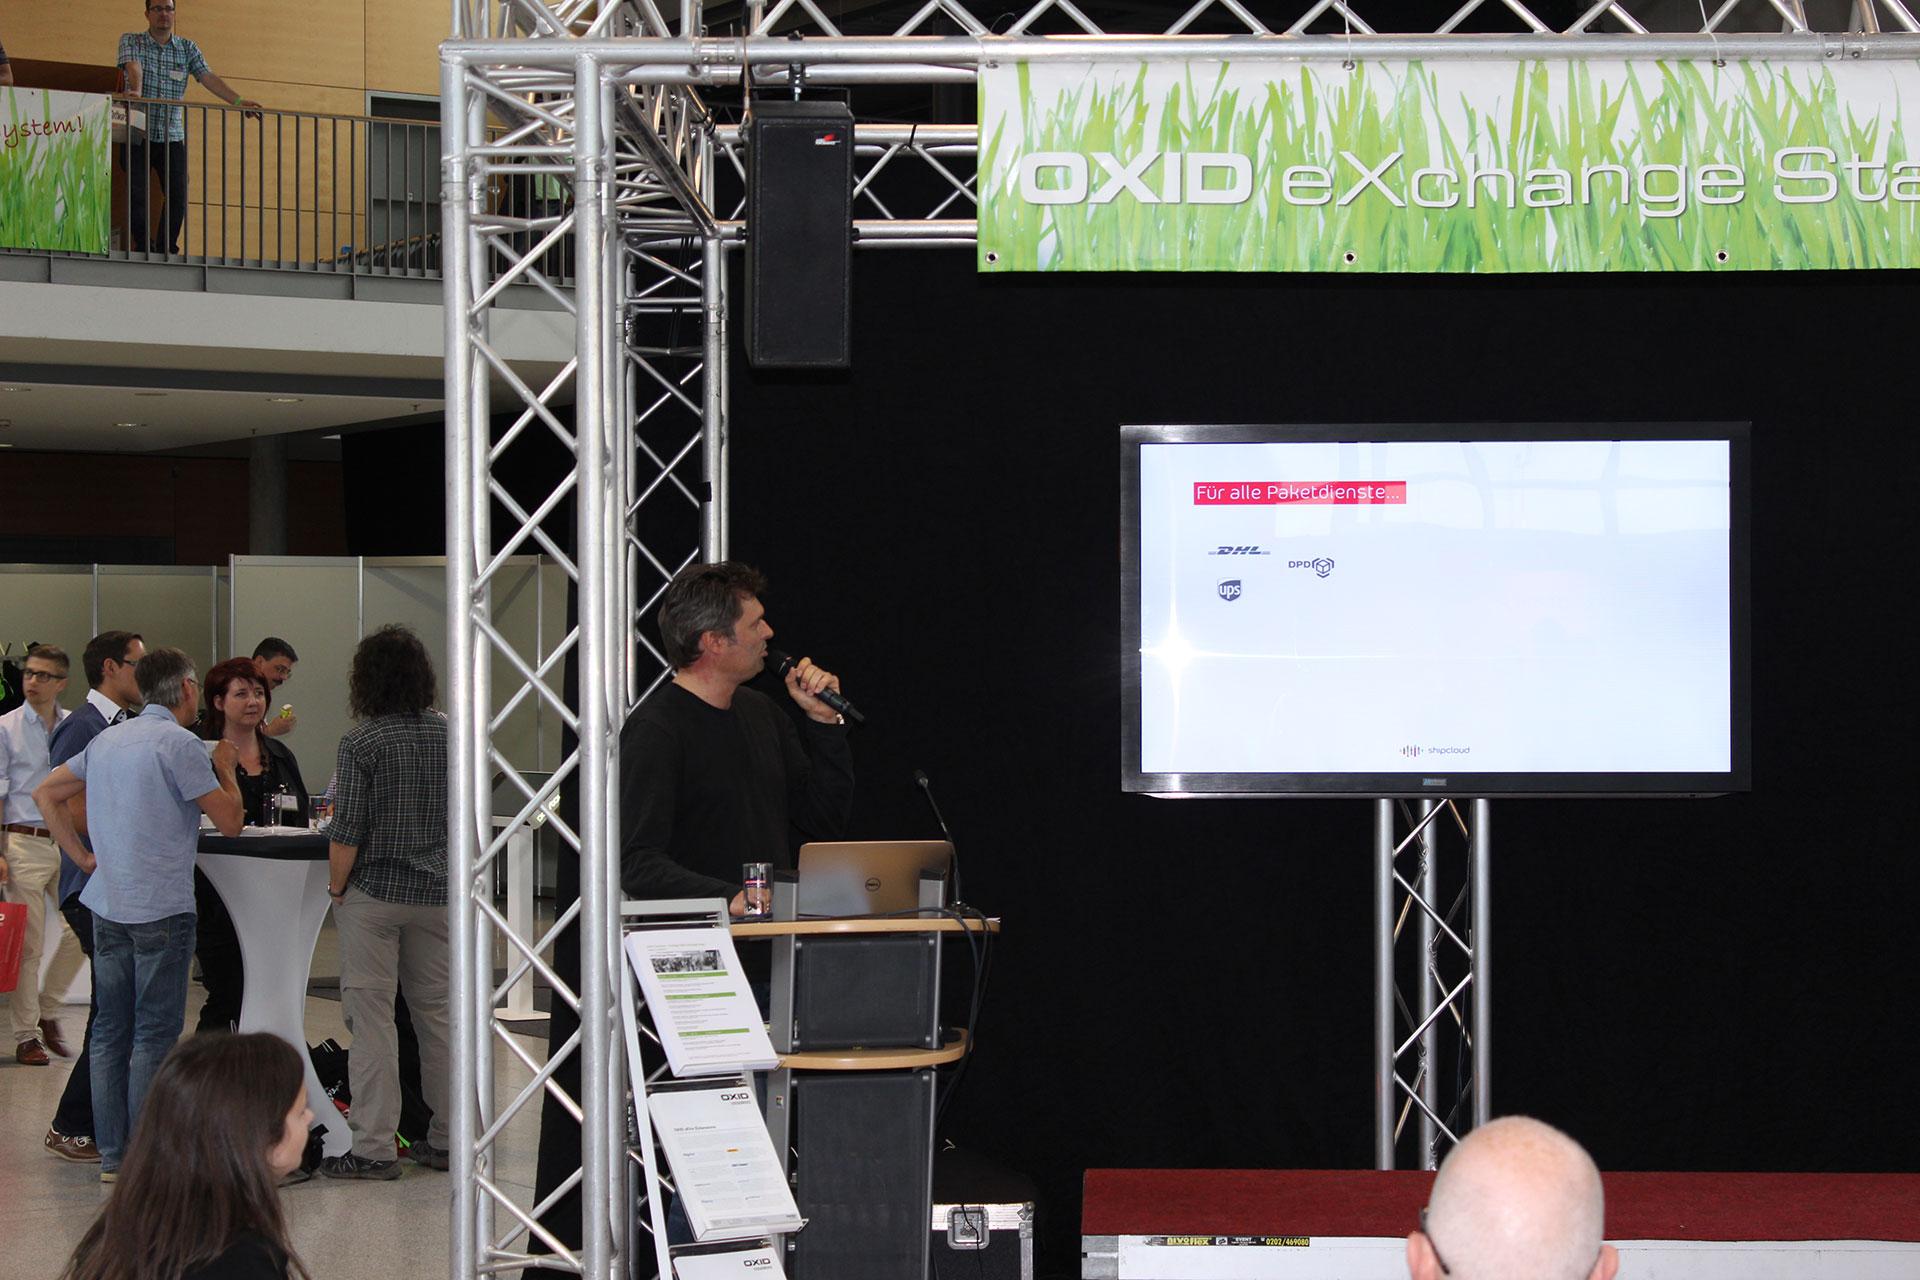 oxid-exchange-stage-developers-voice-auf-der-commons